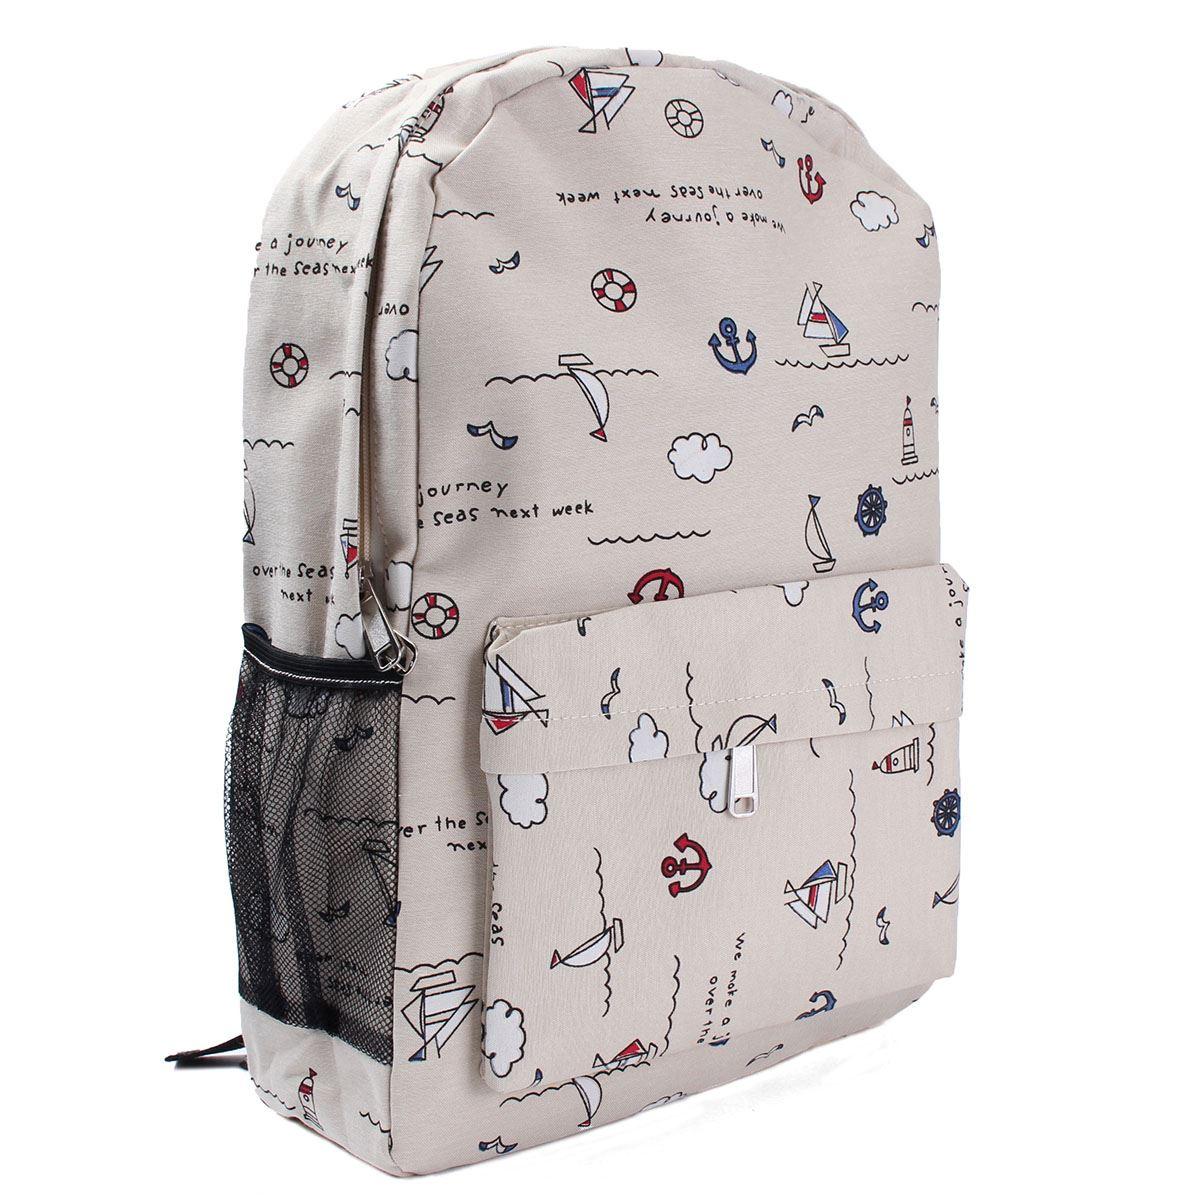 Мода девушки холст рюкзаки якорь рисунок студентов колледжа Mochila женщин мультфильм школа рюкзак сумки 4 цвета